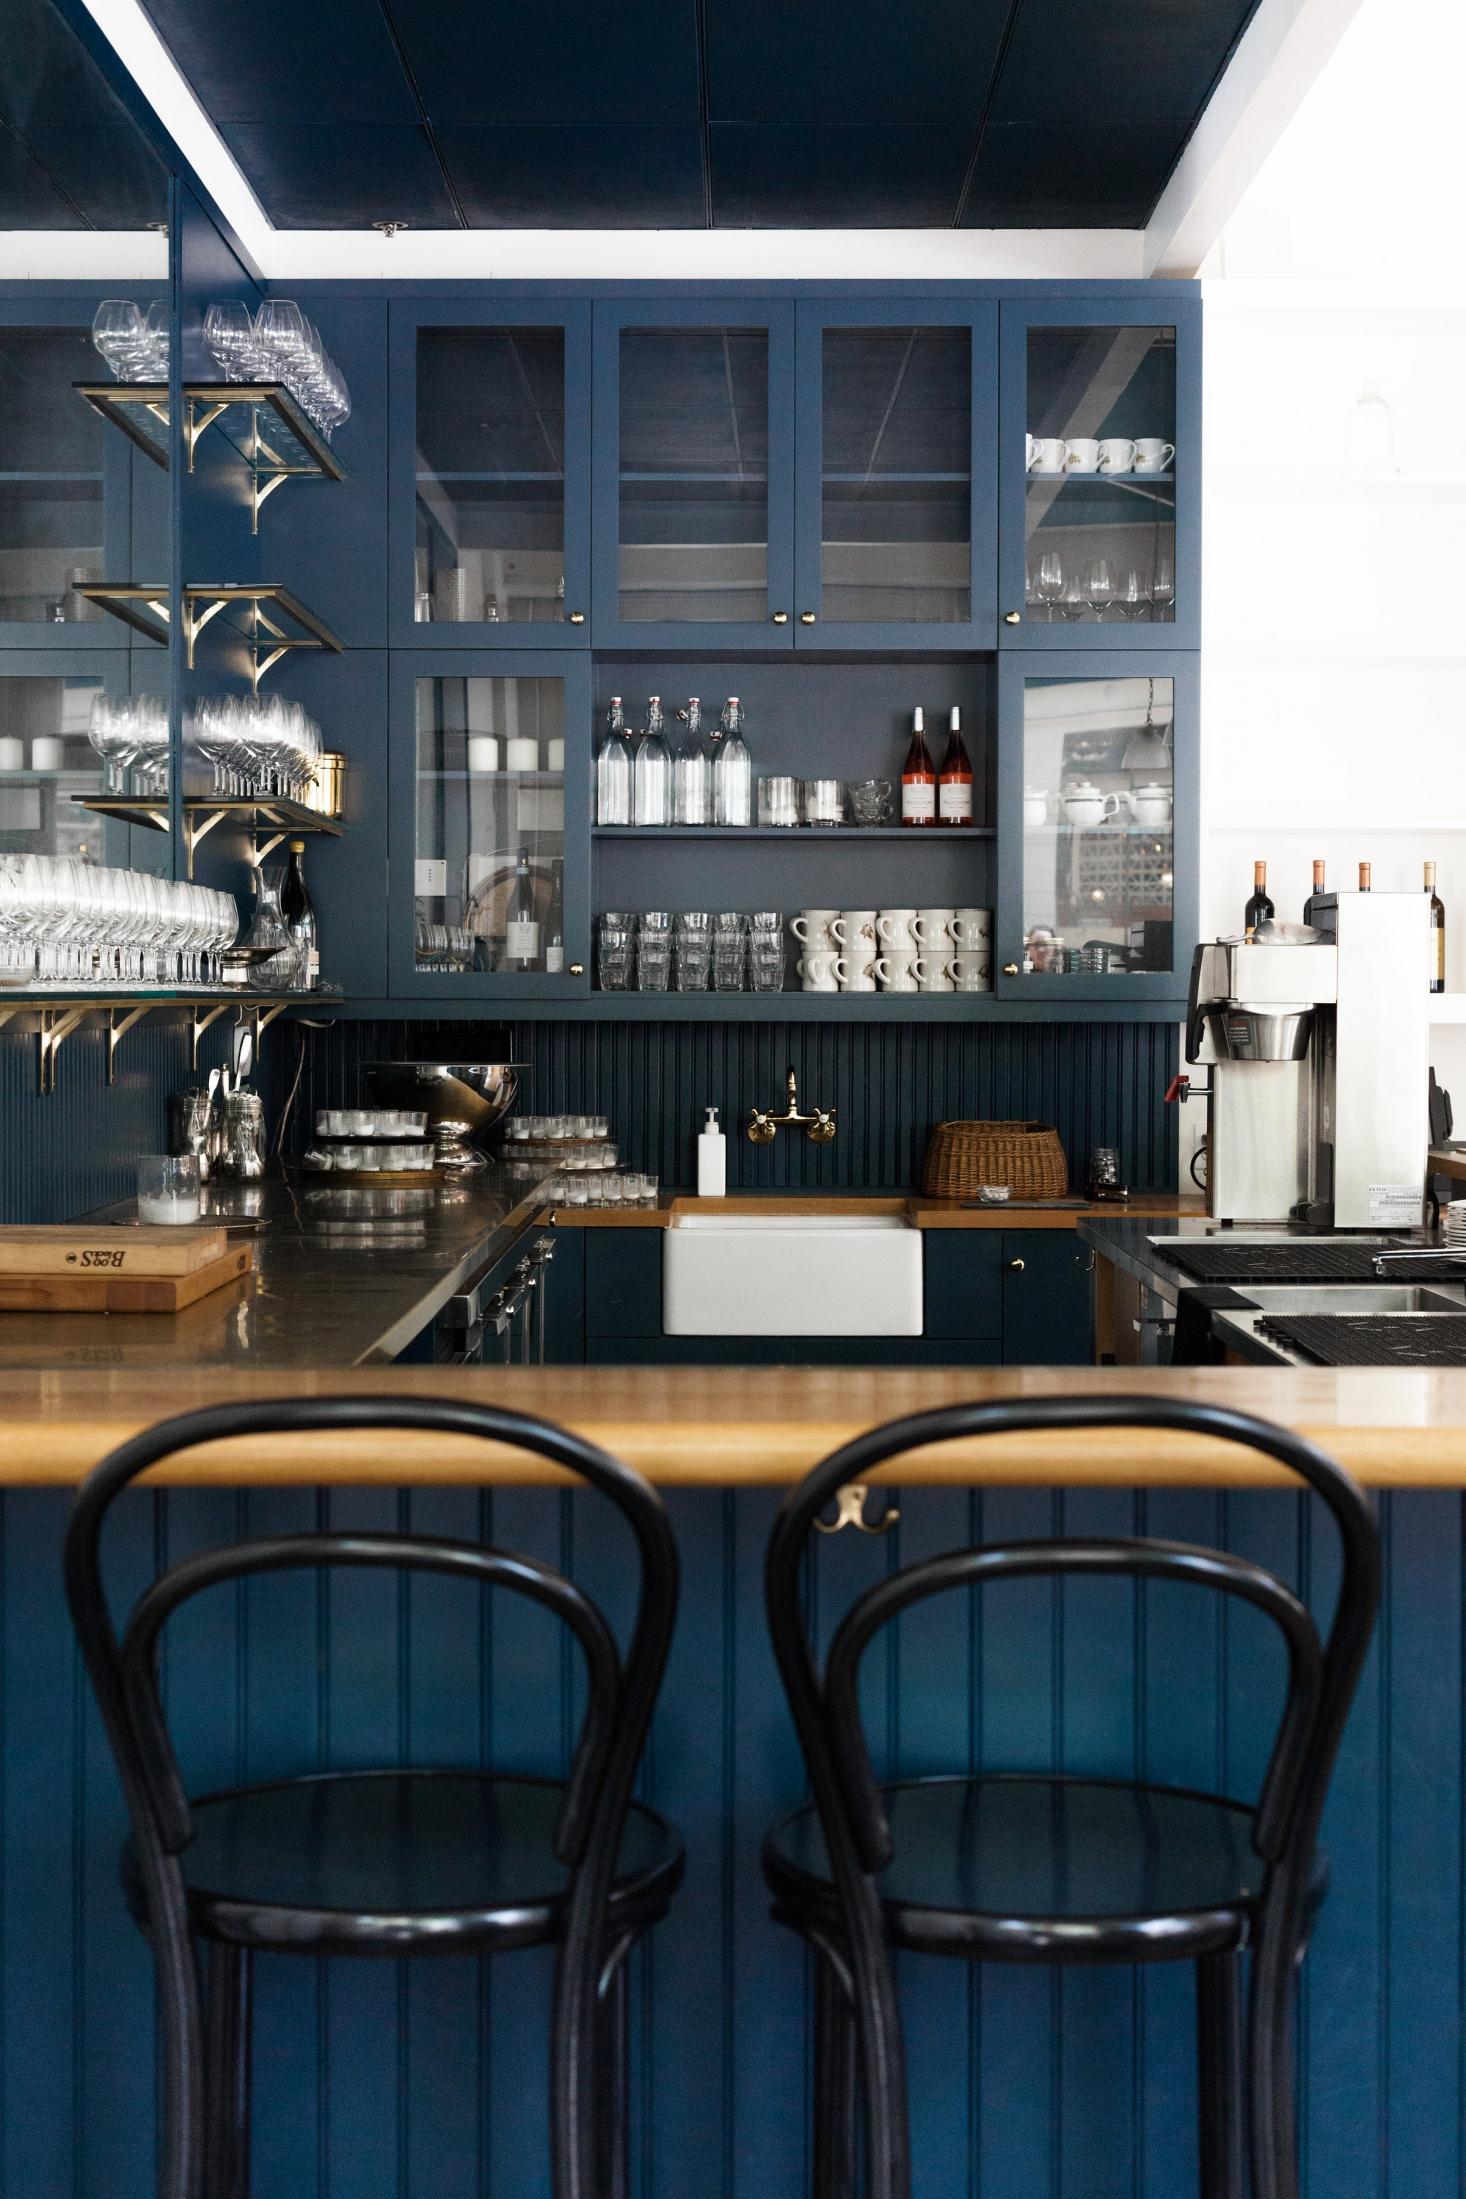 little-london-plane-seattle-blue-kitchen-apron-sink-2-1466x2199.jpg